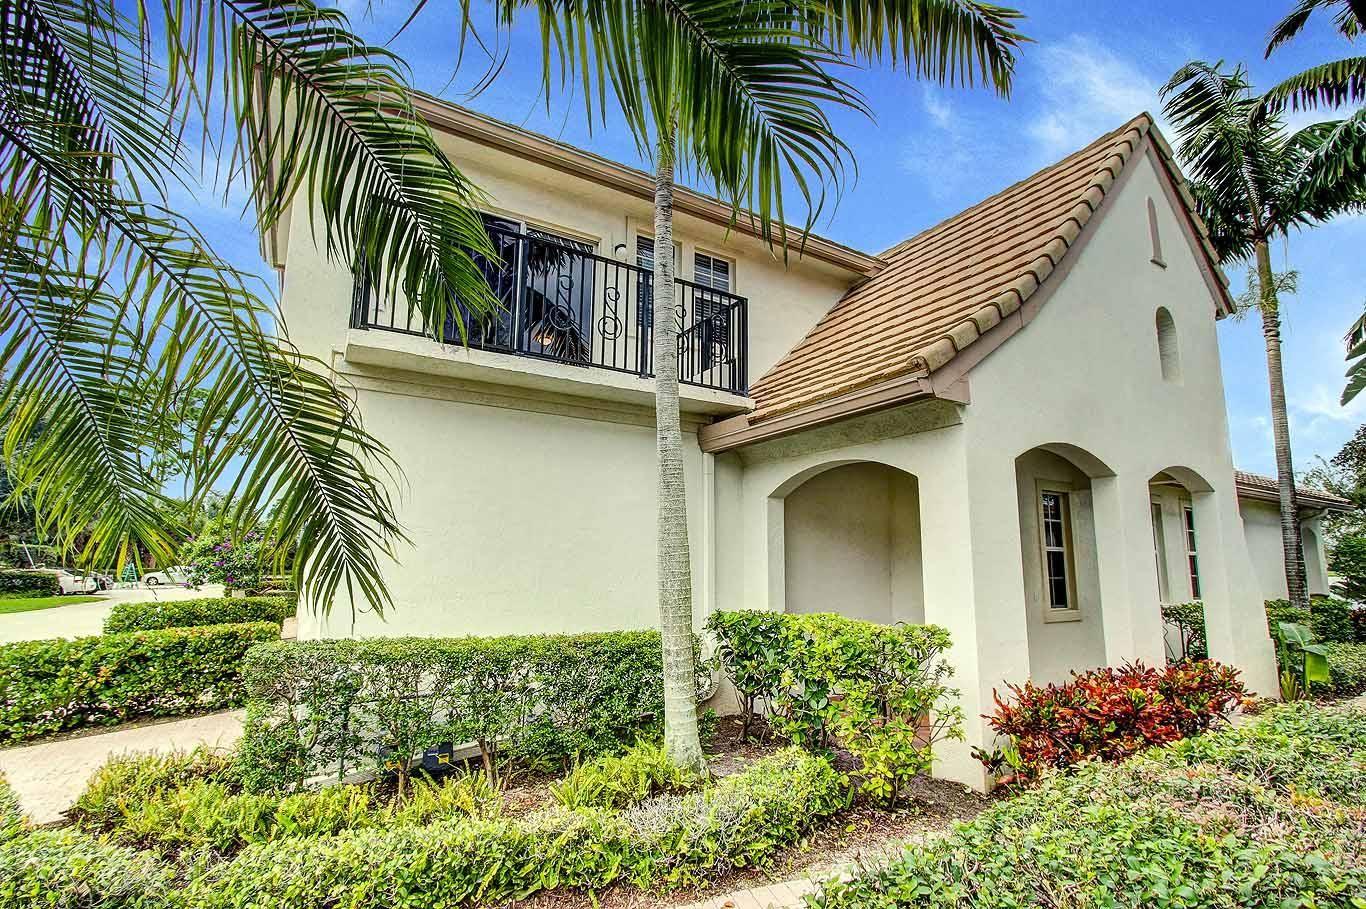 Photo of 173 Evergrene Parkway, Palm Beach Gardens, FL 33410 (MLS # RX-10665511)